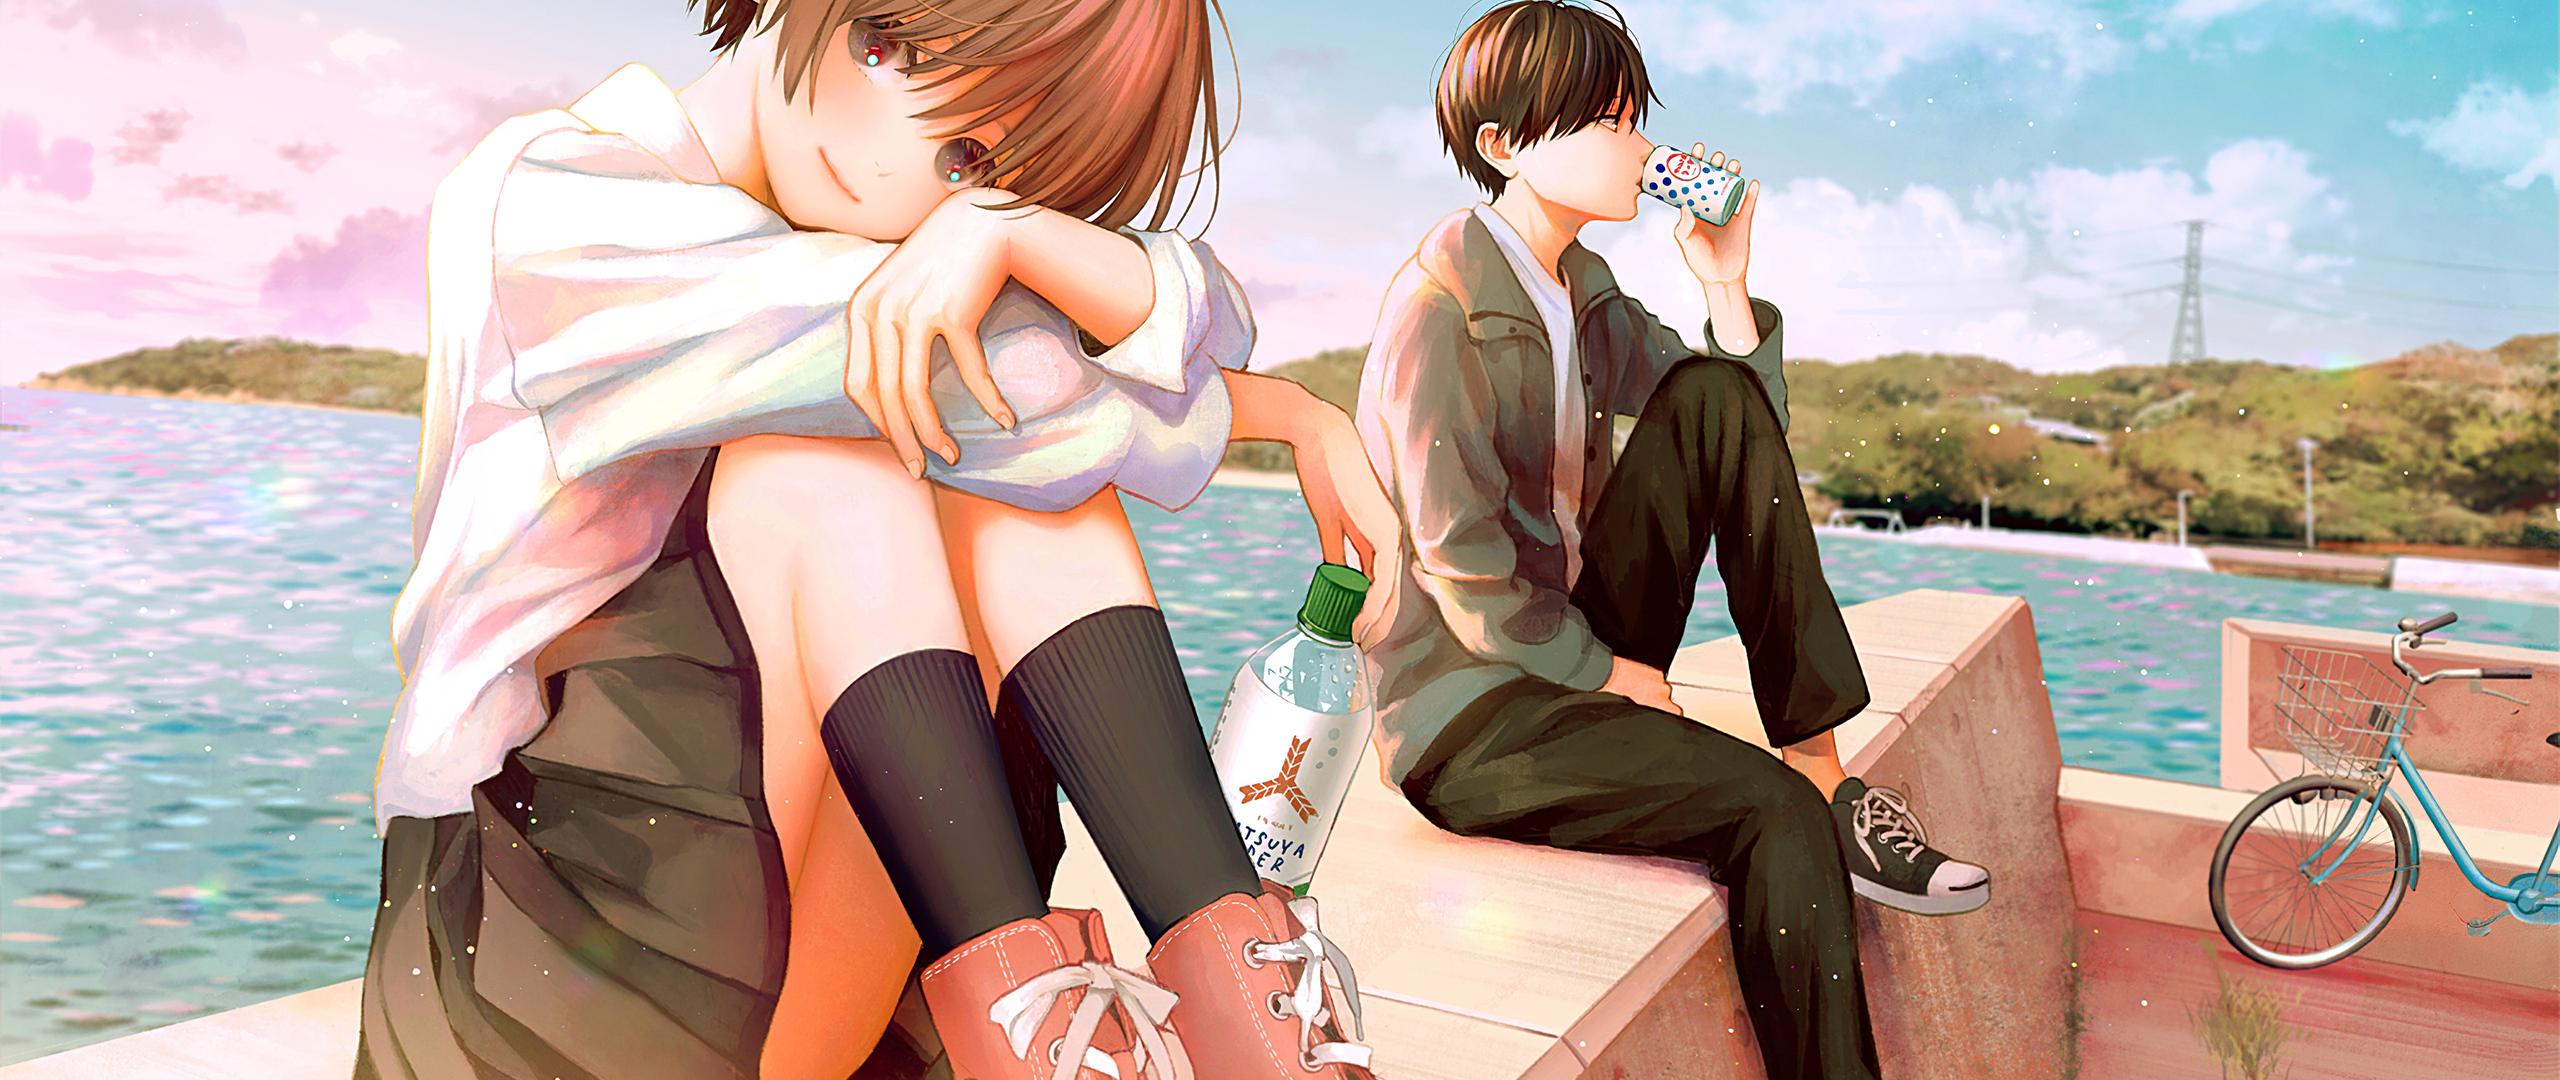 teenage-anime-couple-school-dress-4k-aq.jpg